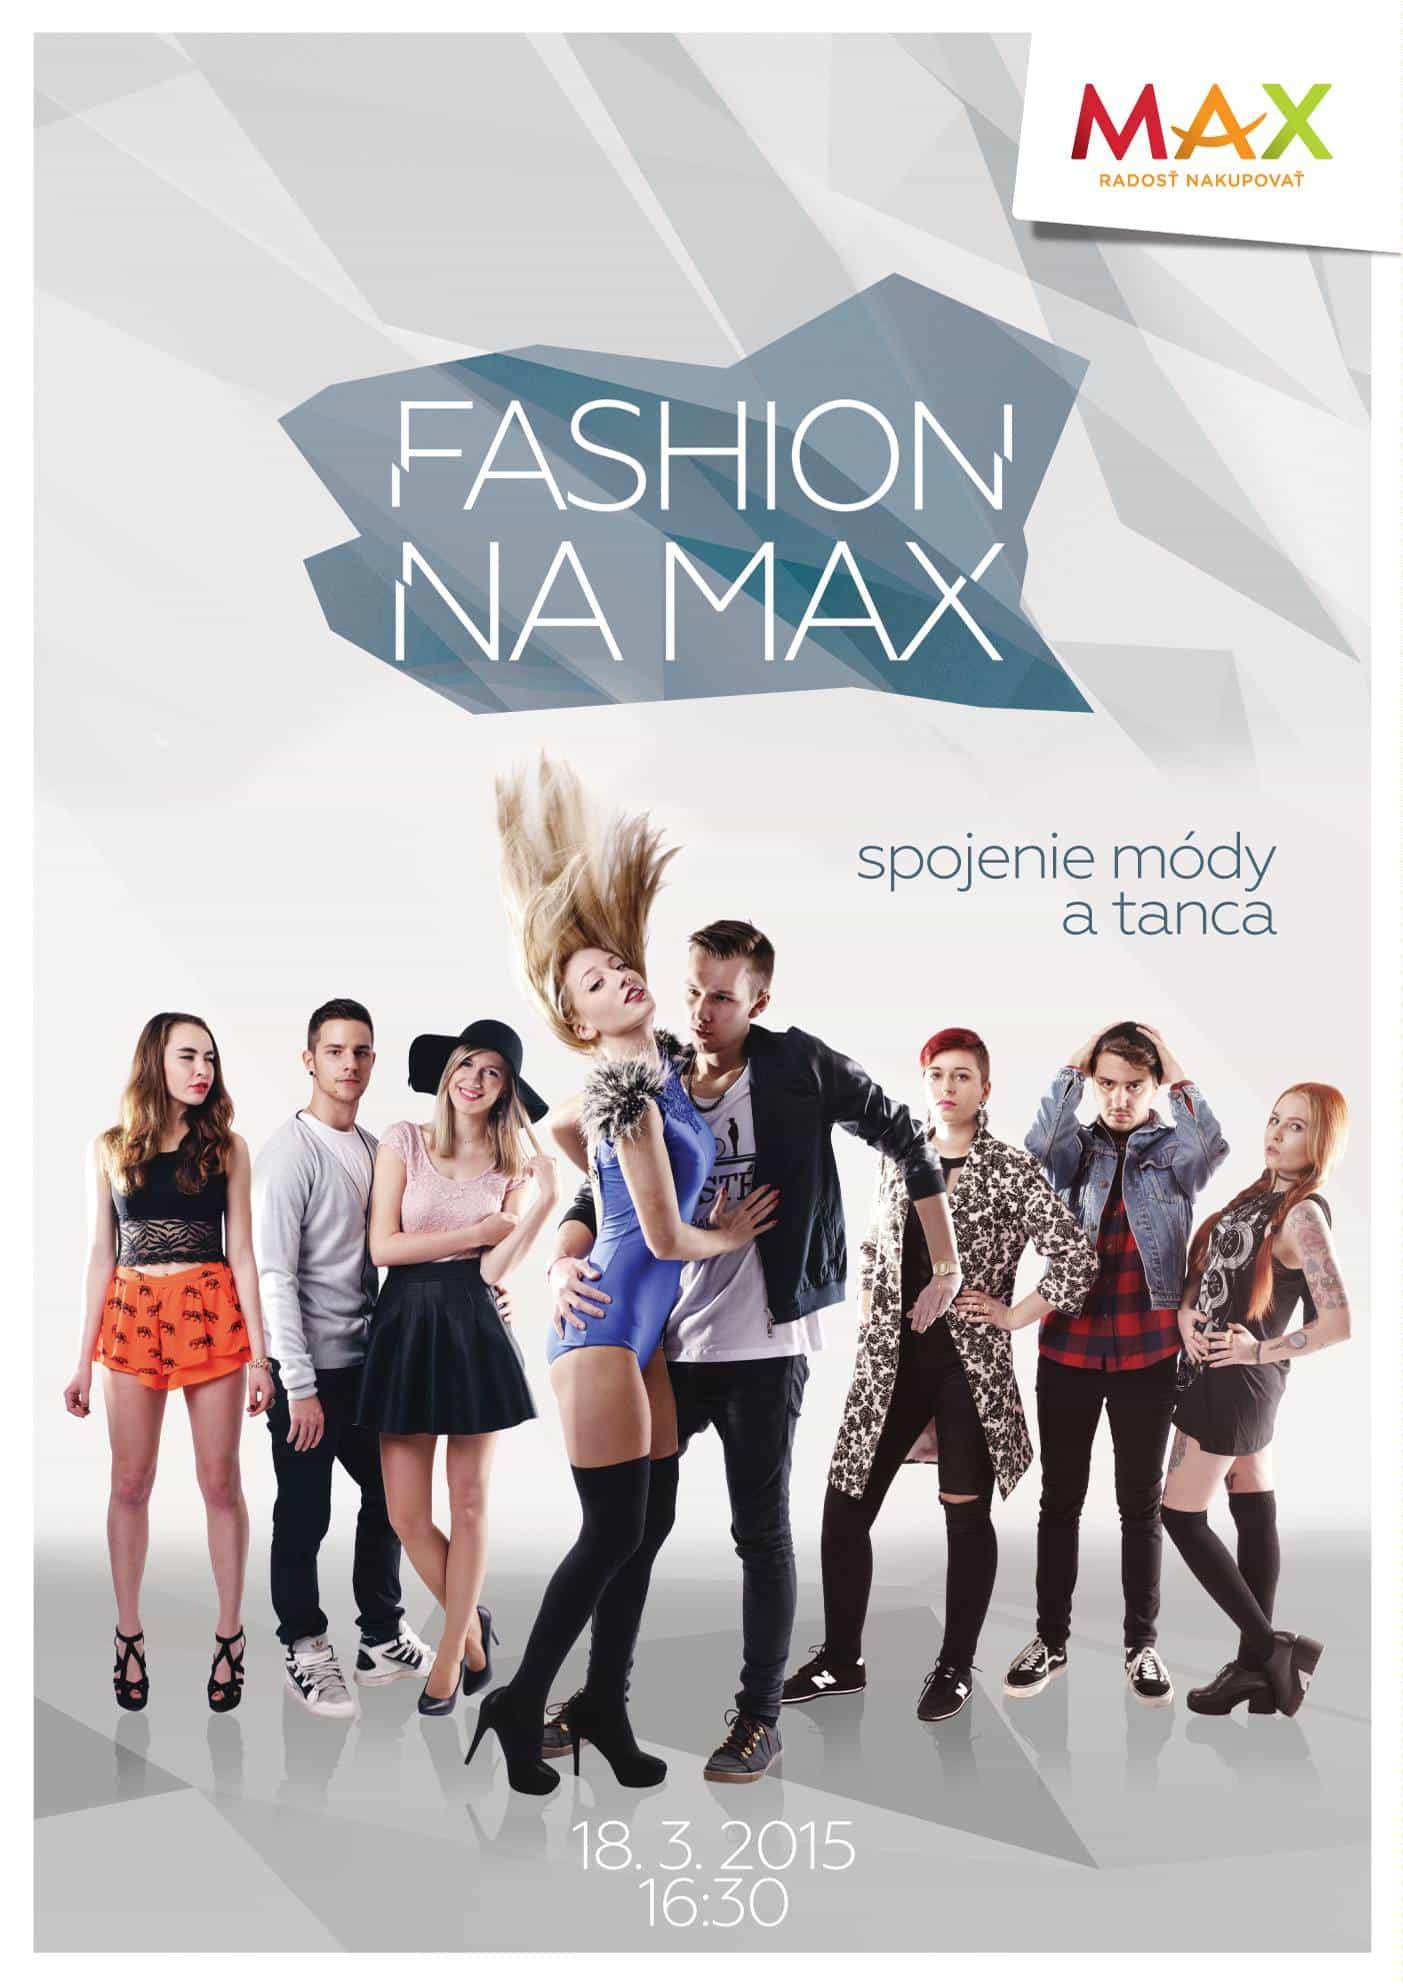 Fashion na Max 2015 - plagát